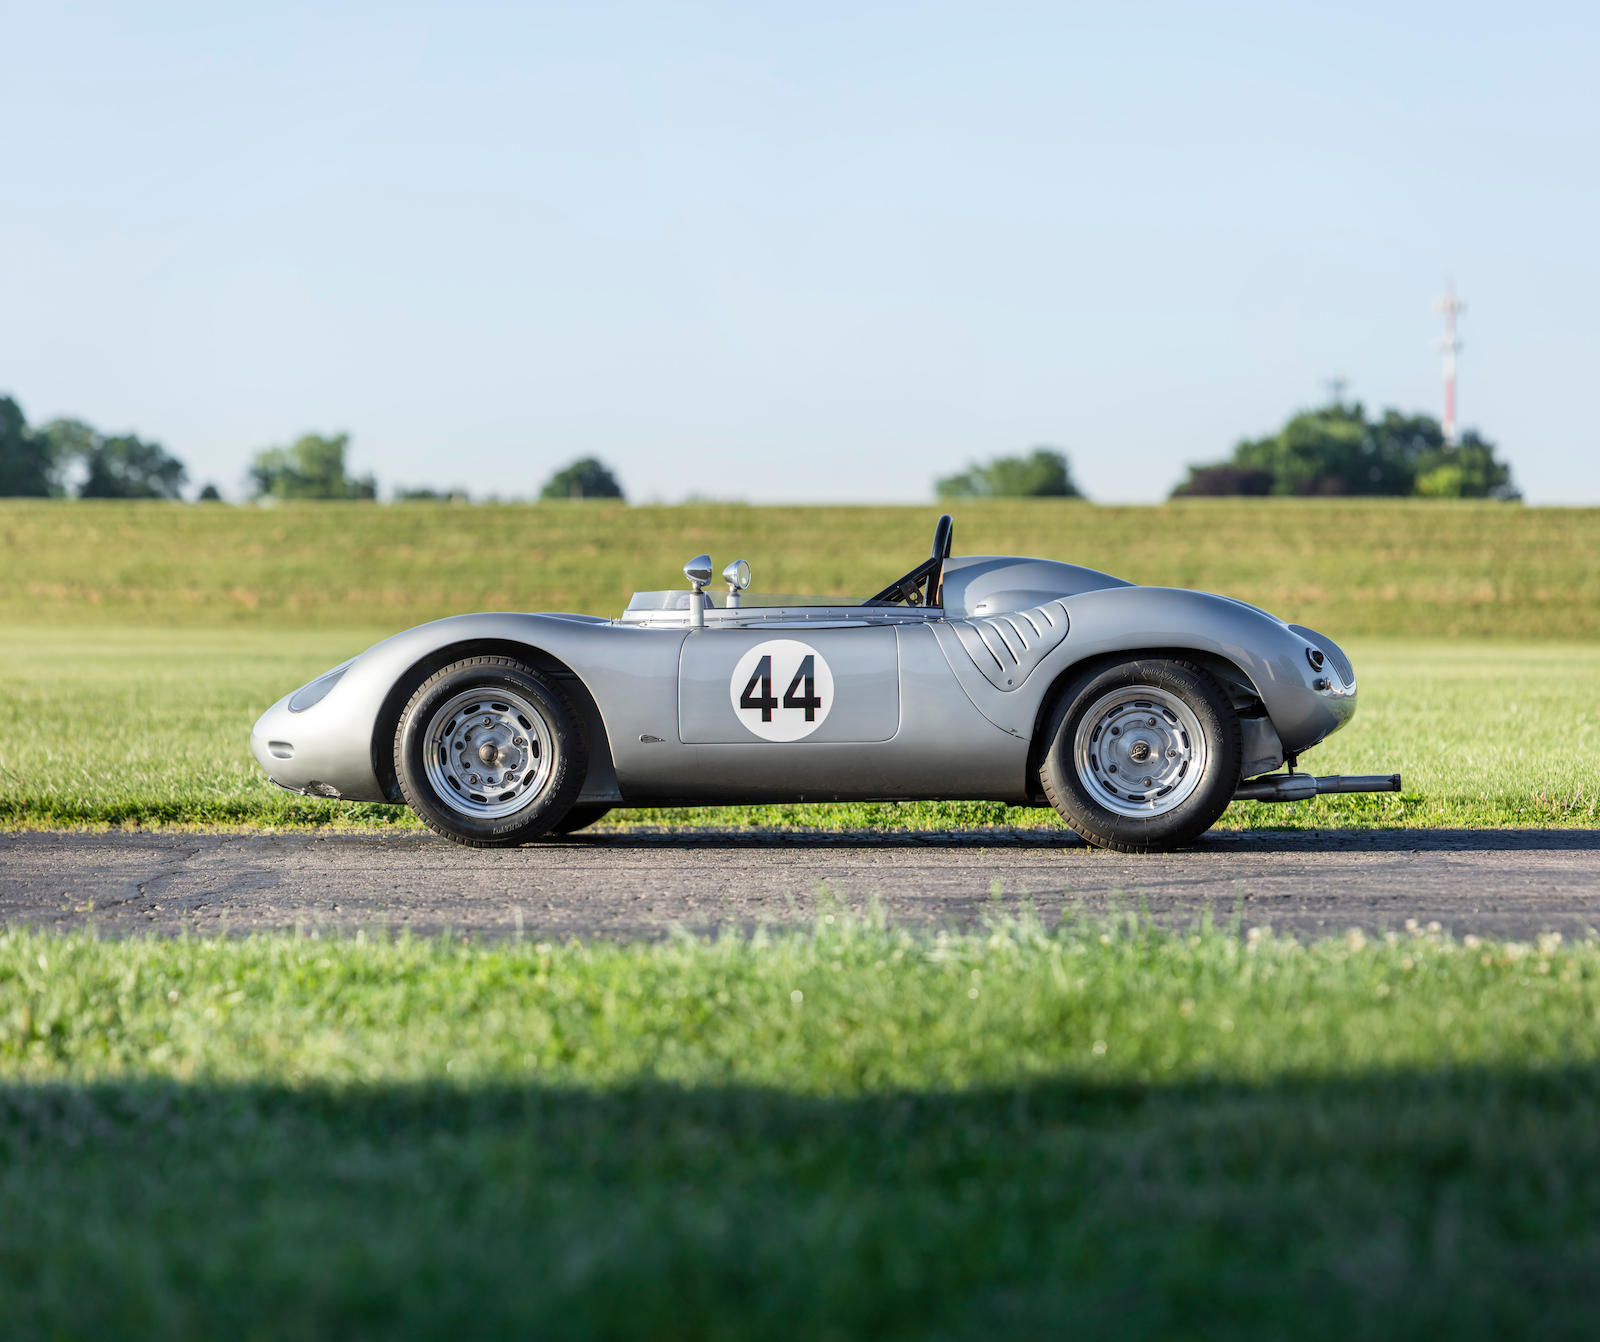 1959 Porsche 718 RSK profile